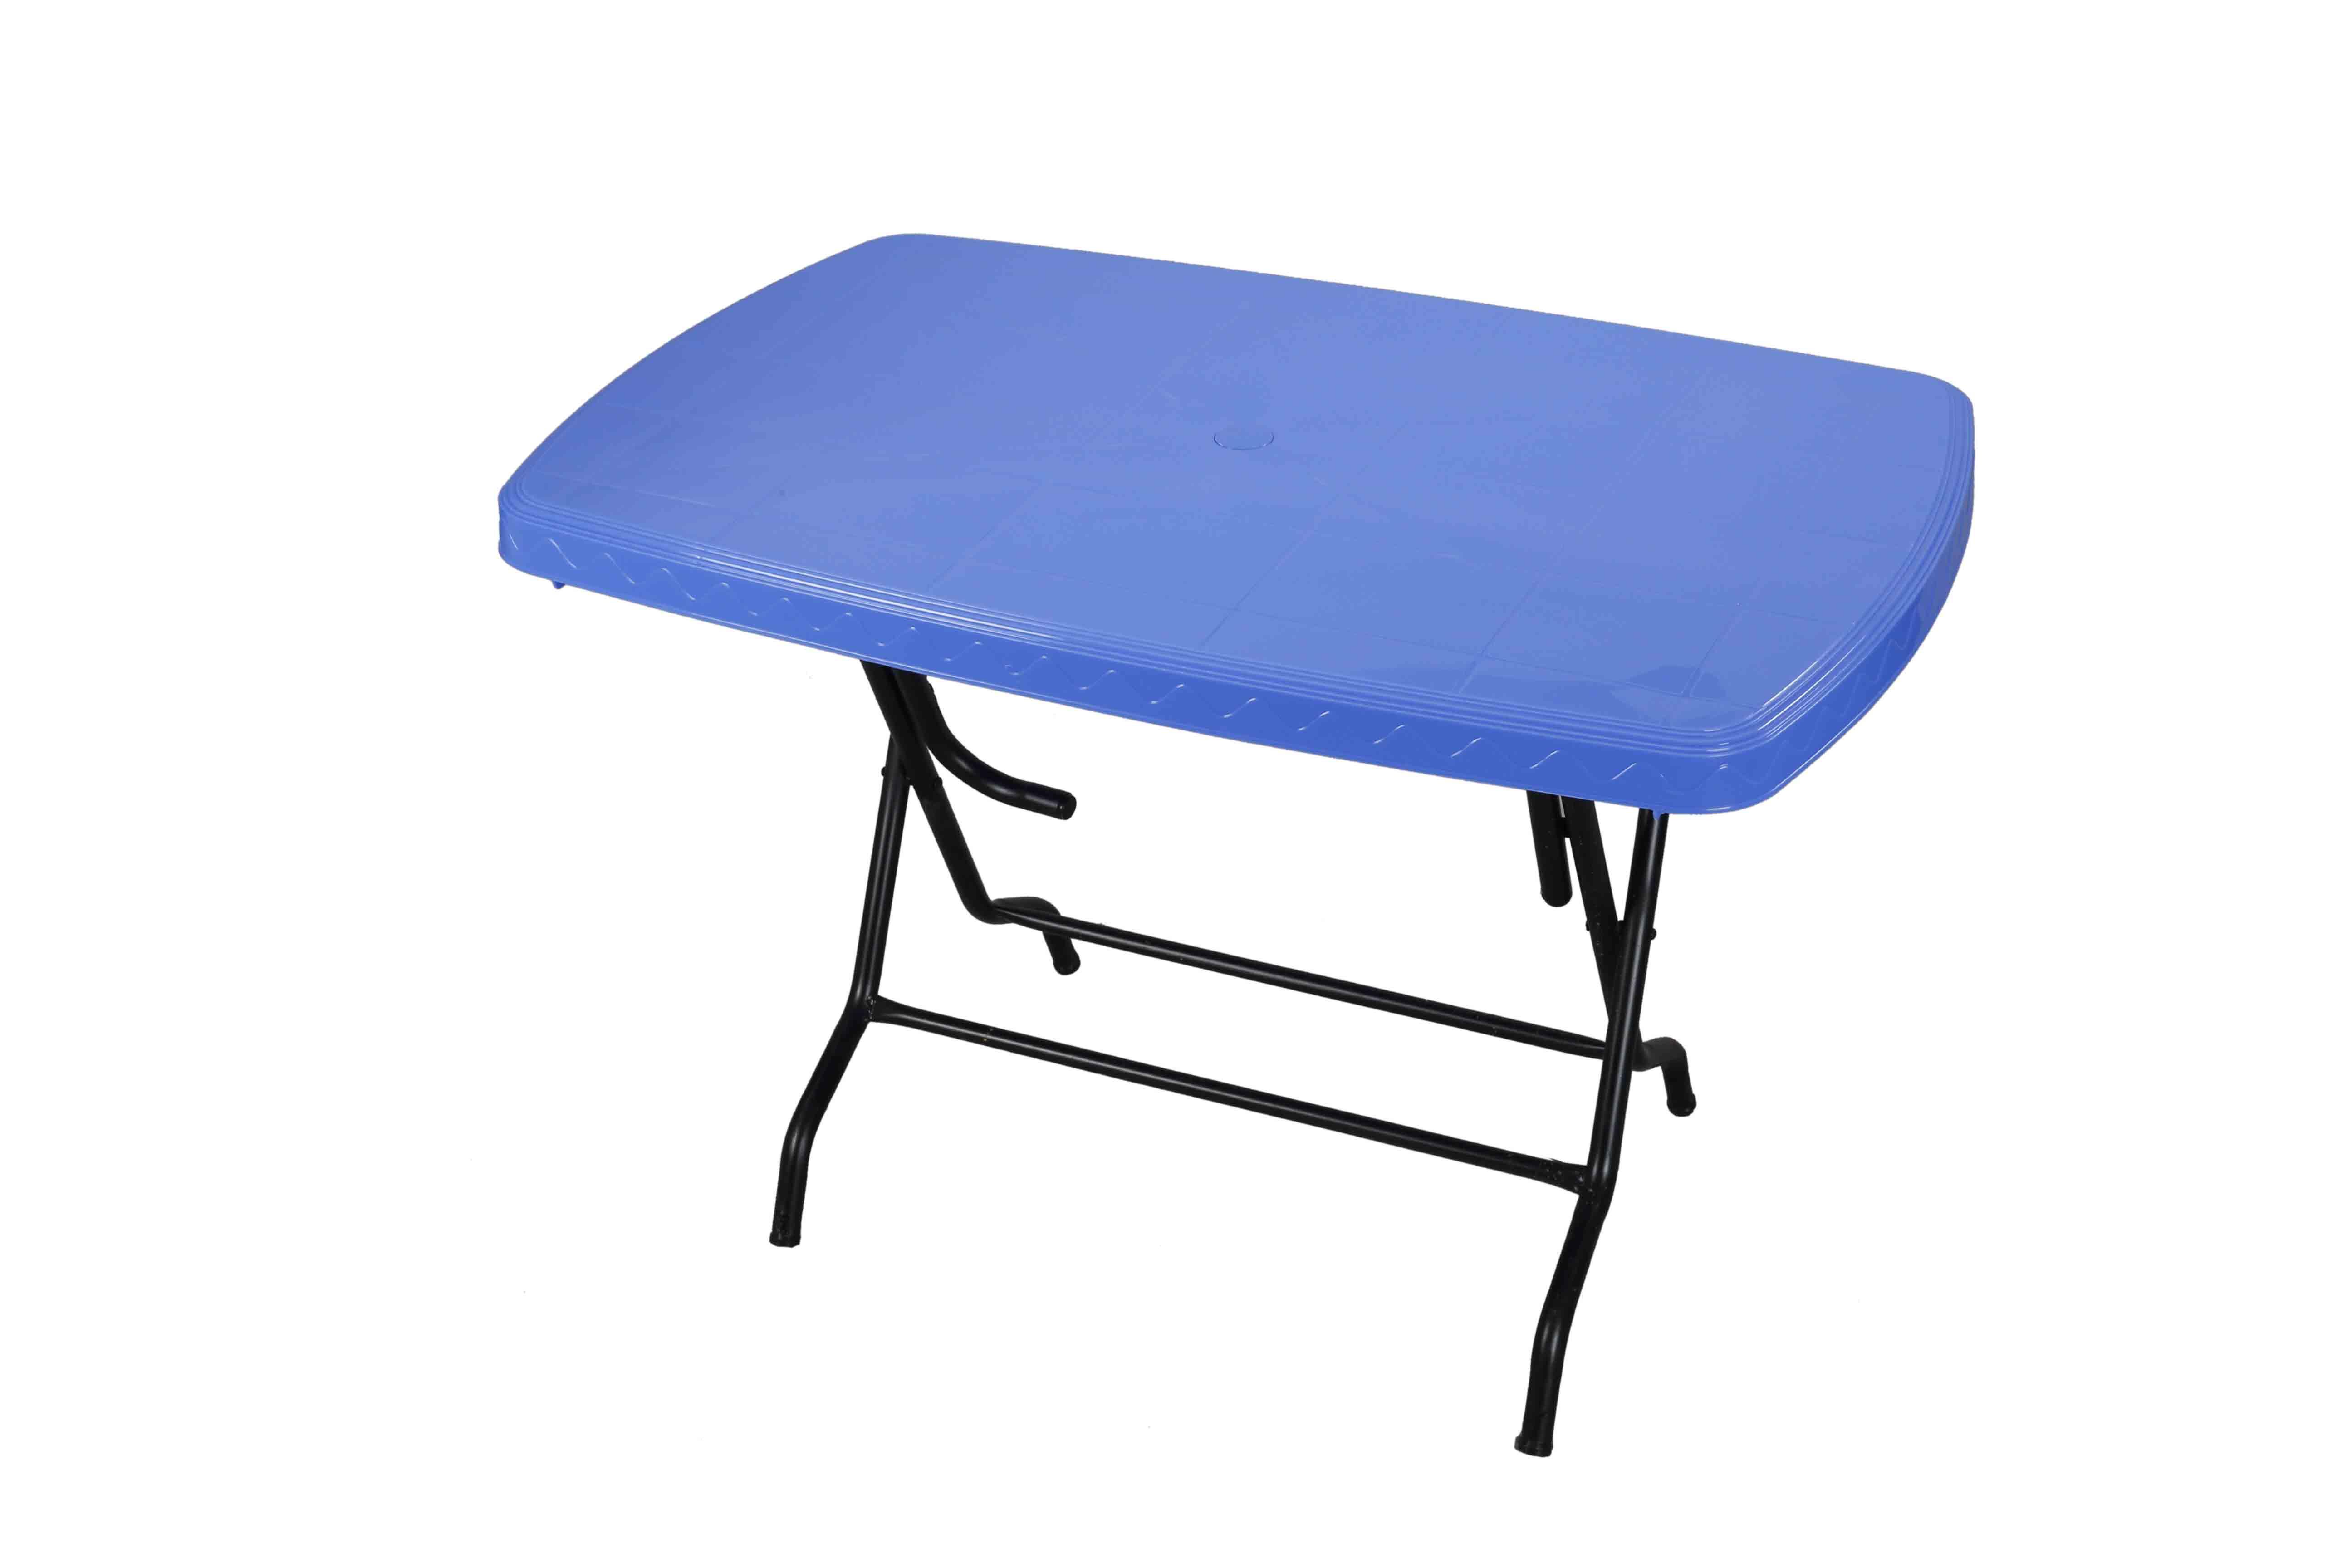 Dining Table 4 Seat Rtg St/Leg – SM Blue